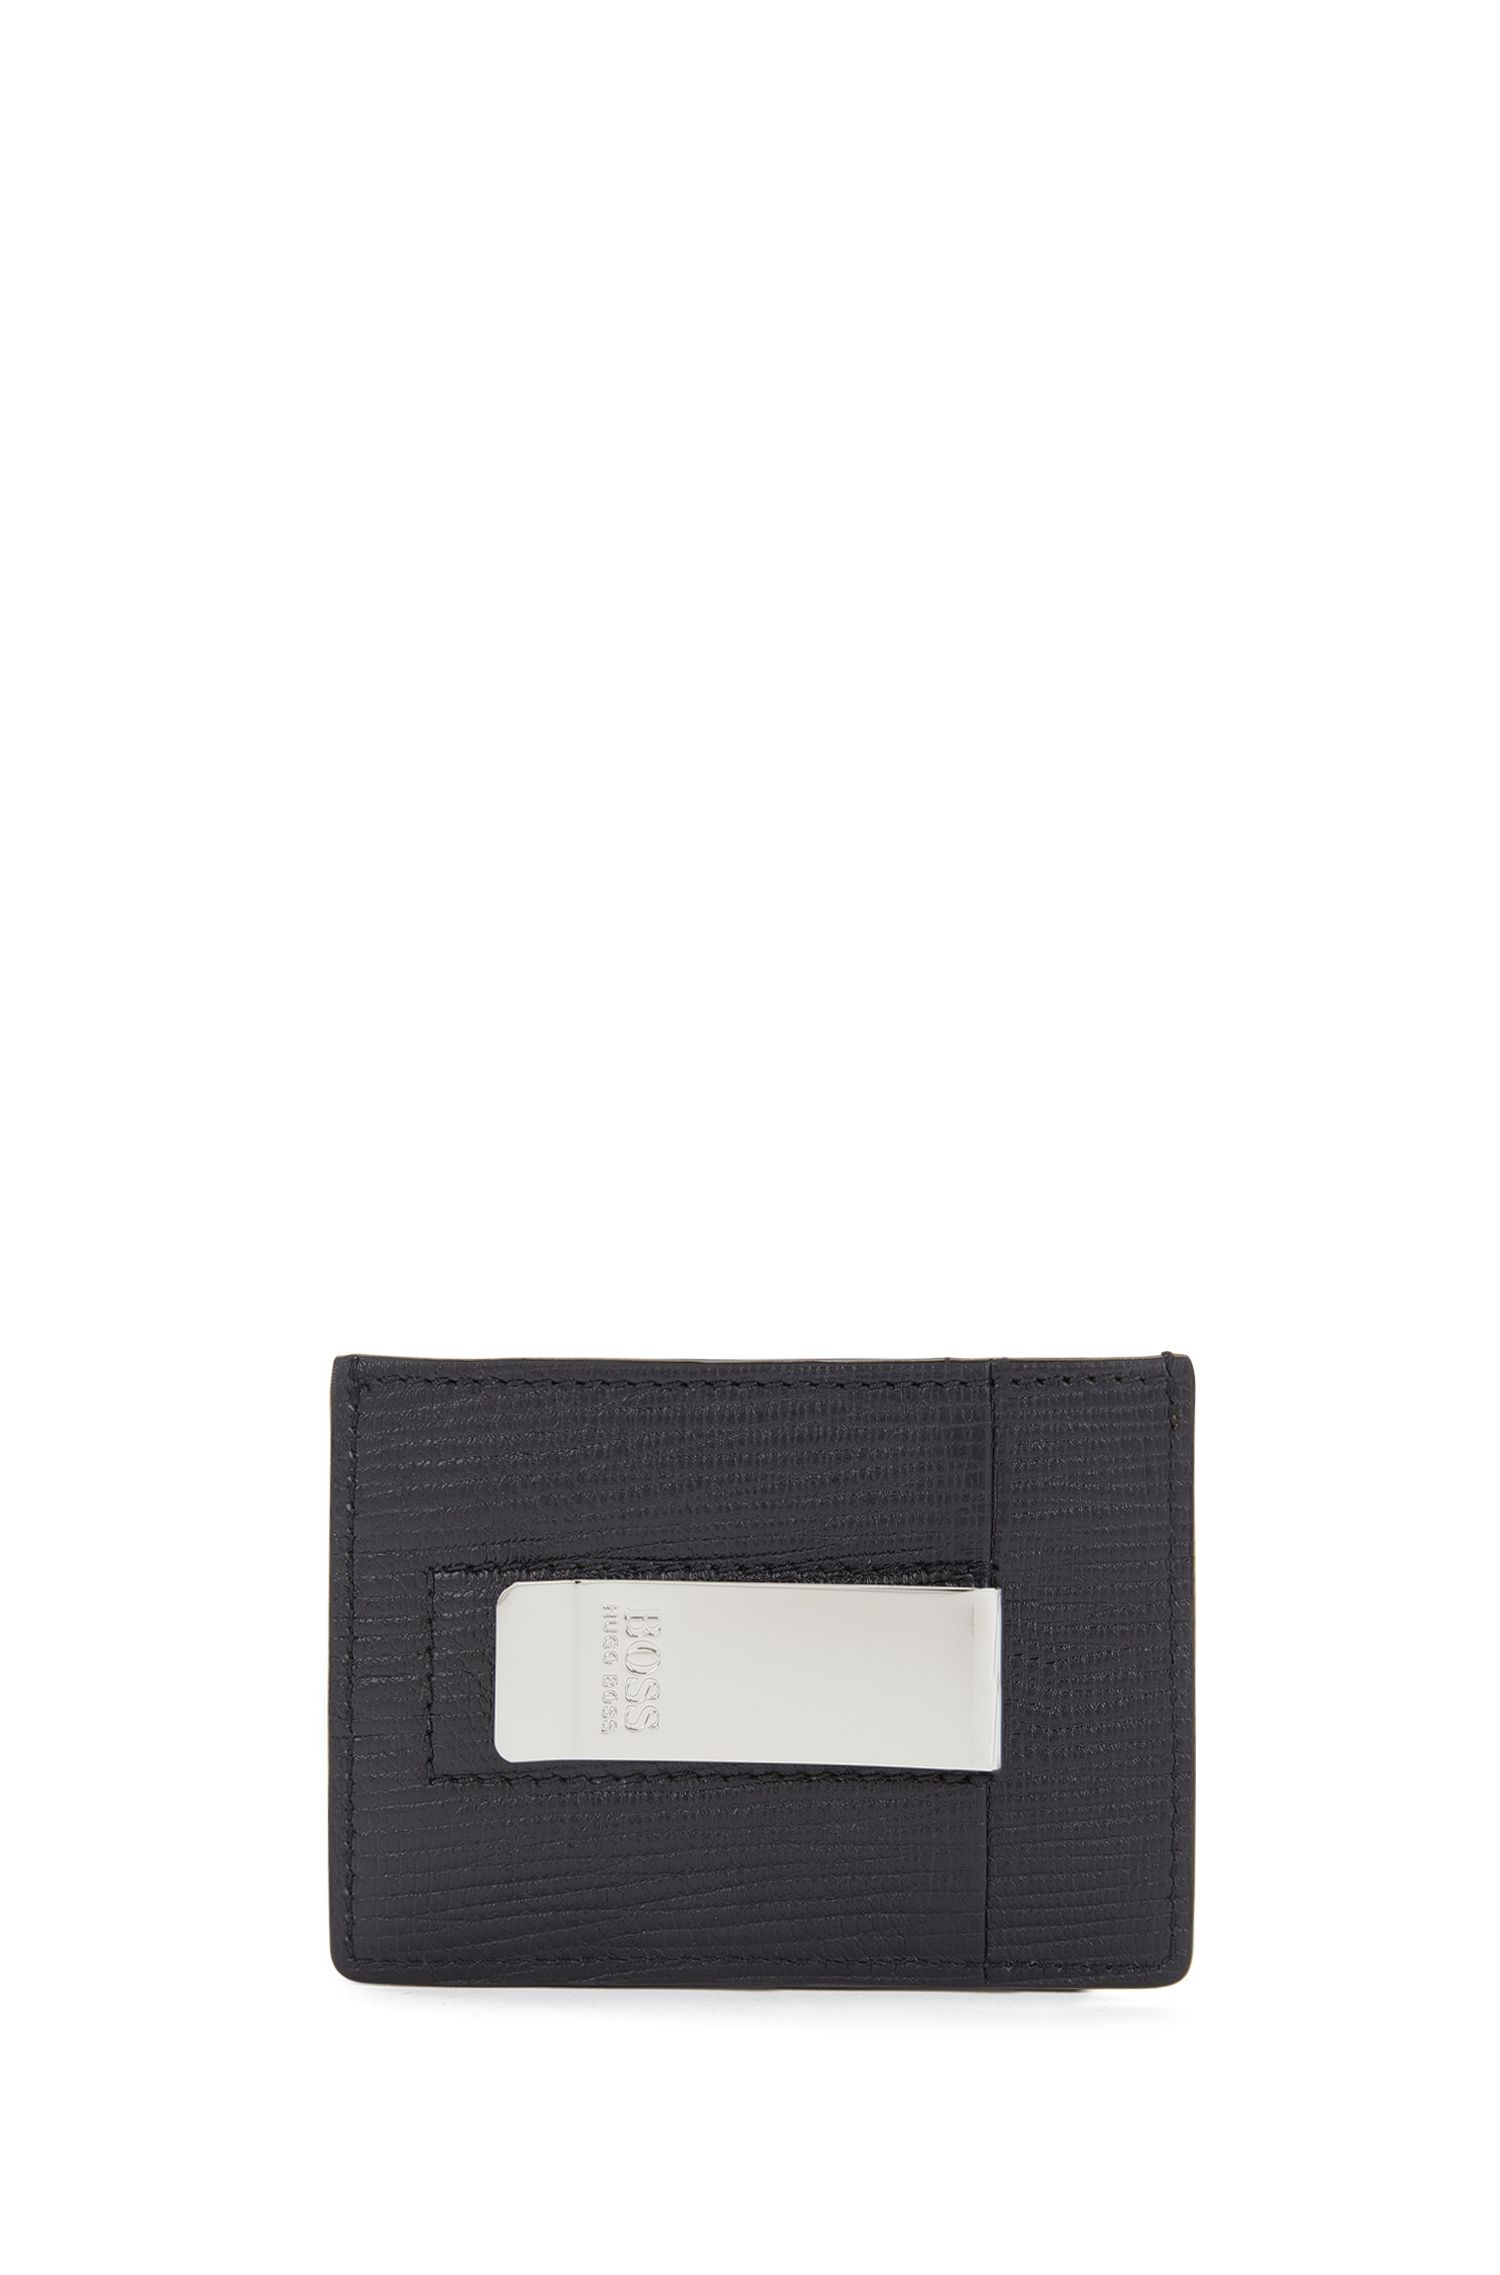 Card Holder With Money Clip | Timeless Money Clip, Dark Blue